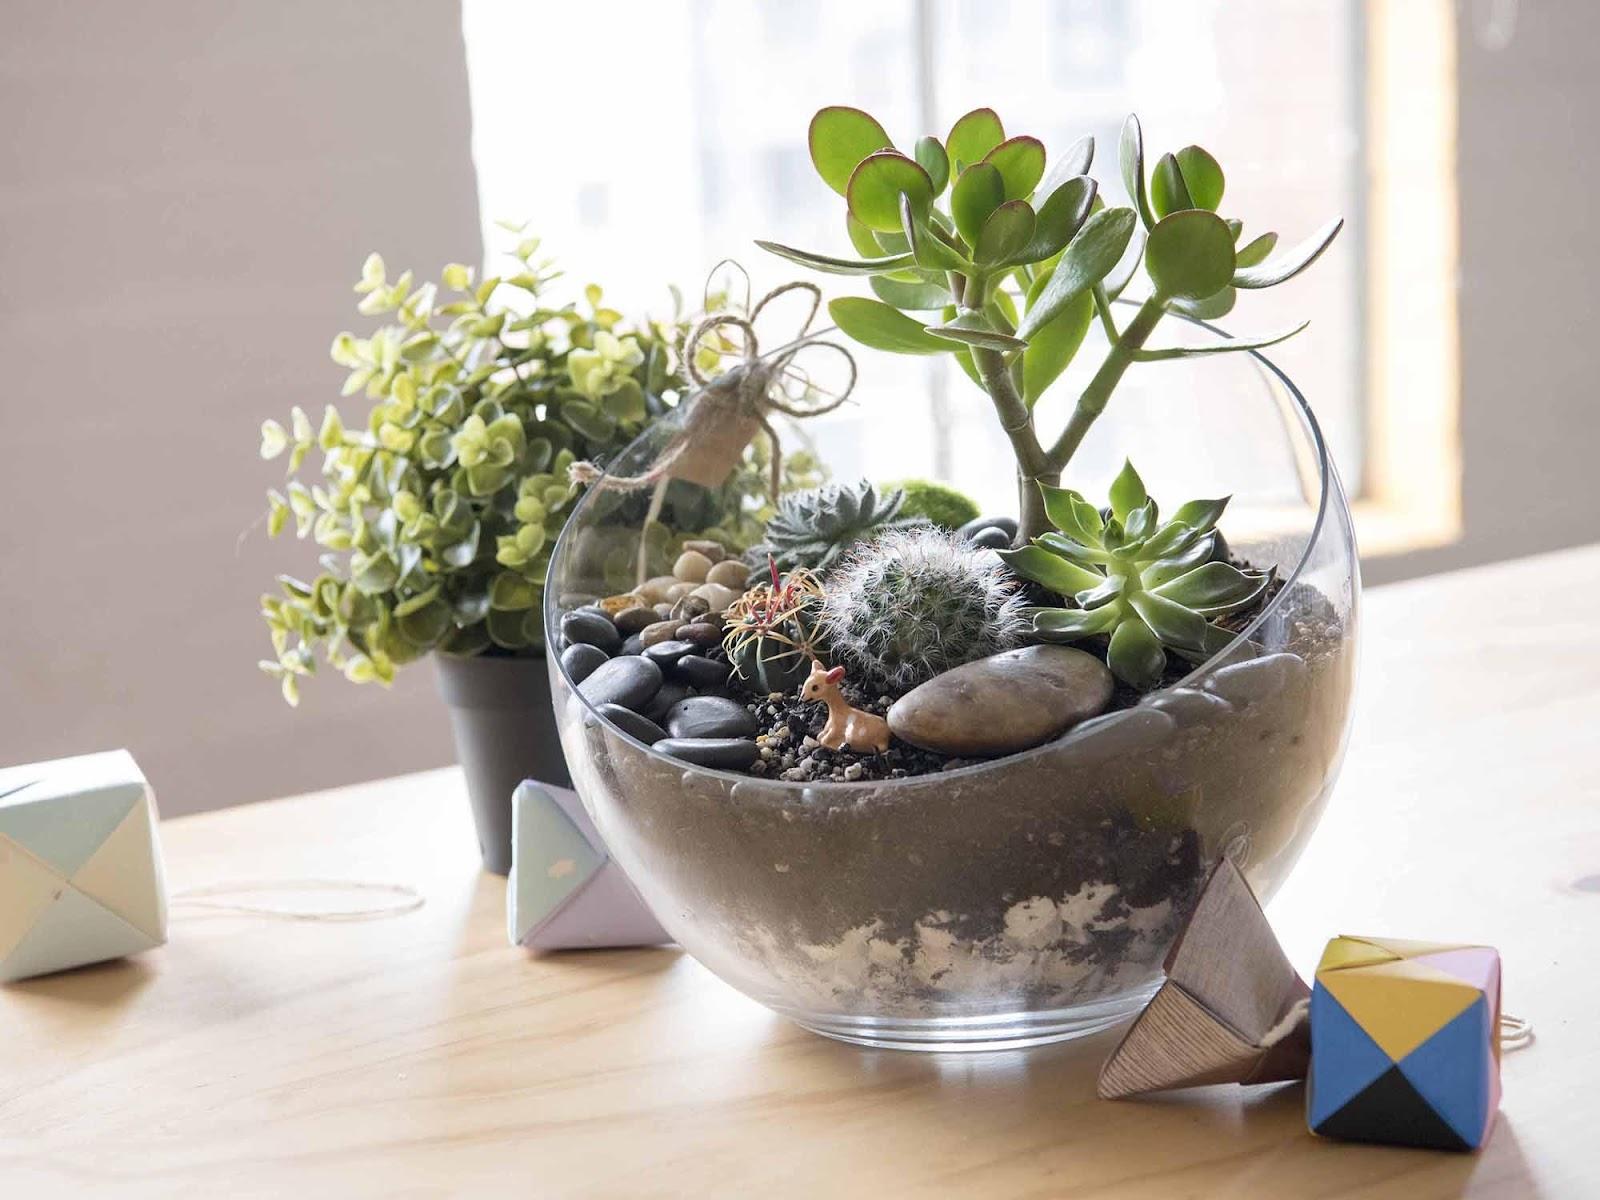 How to Make a Self-Sustaining Terrarium